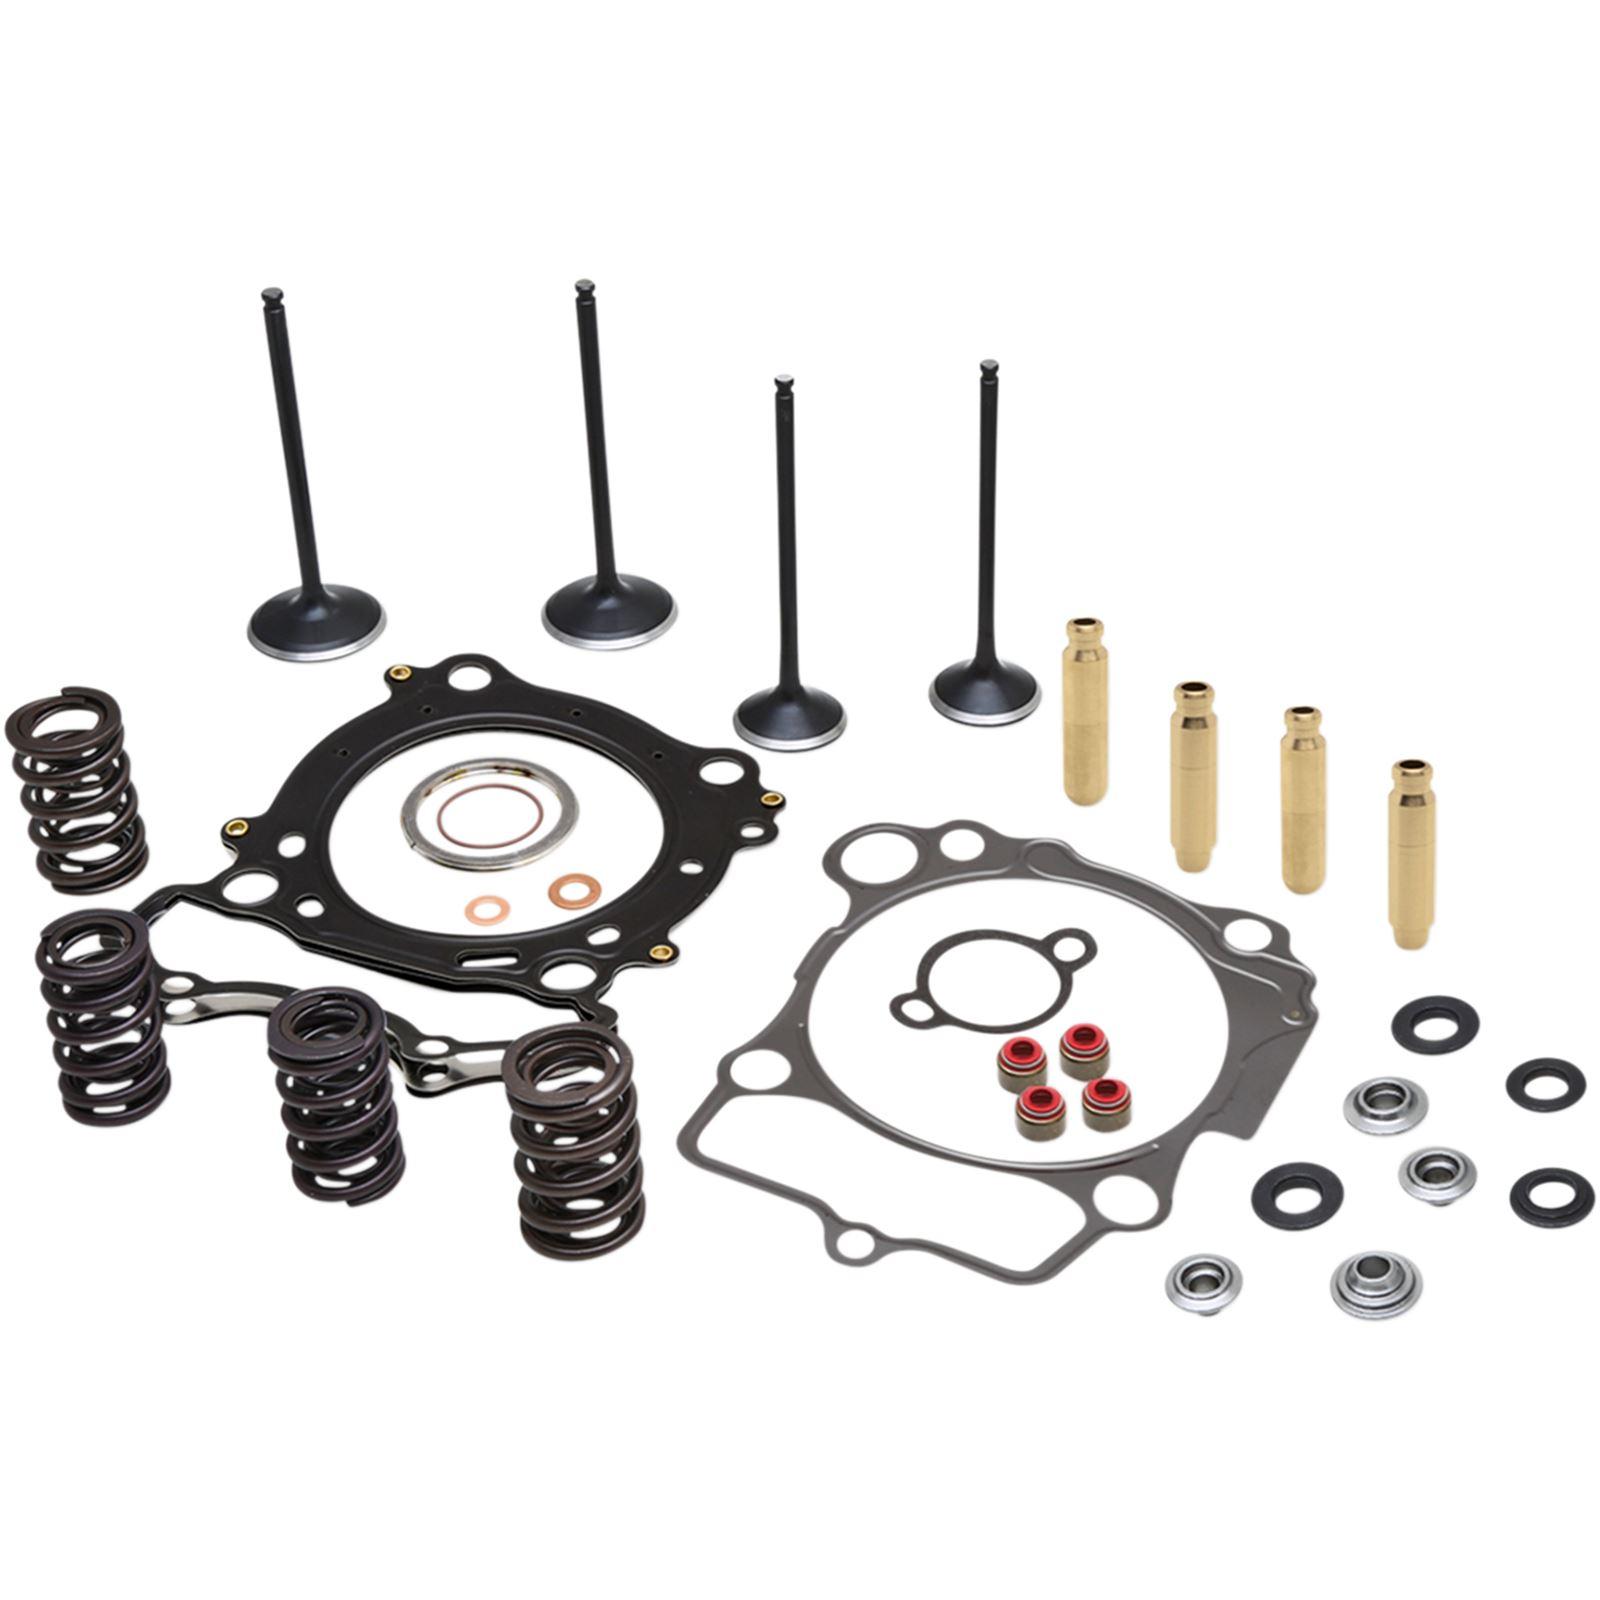 KPMI Cylinder Head Service Kit